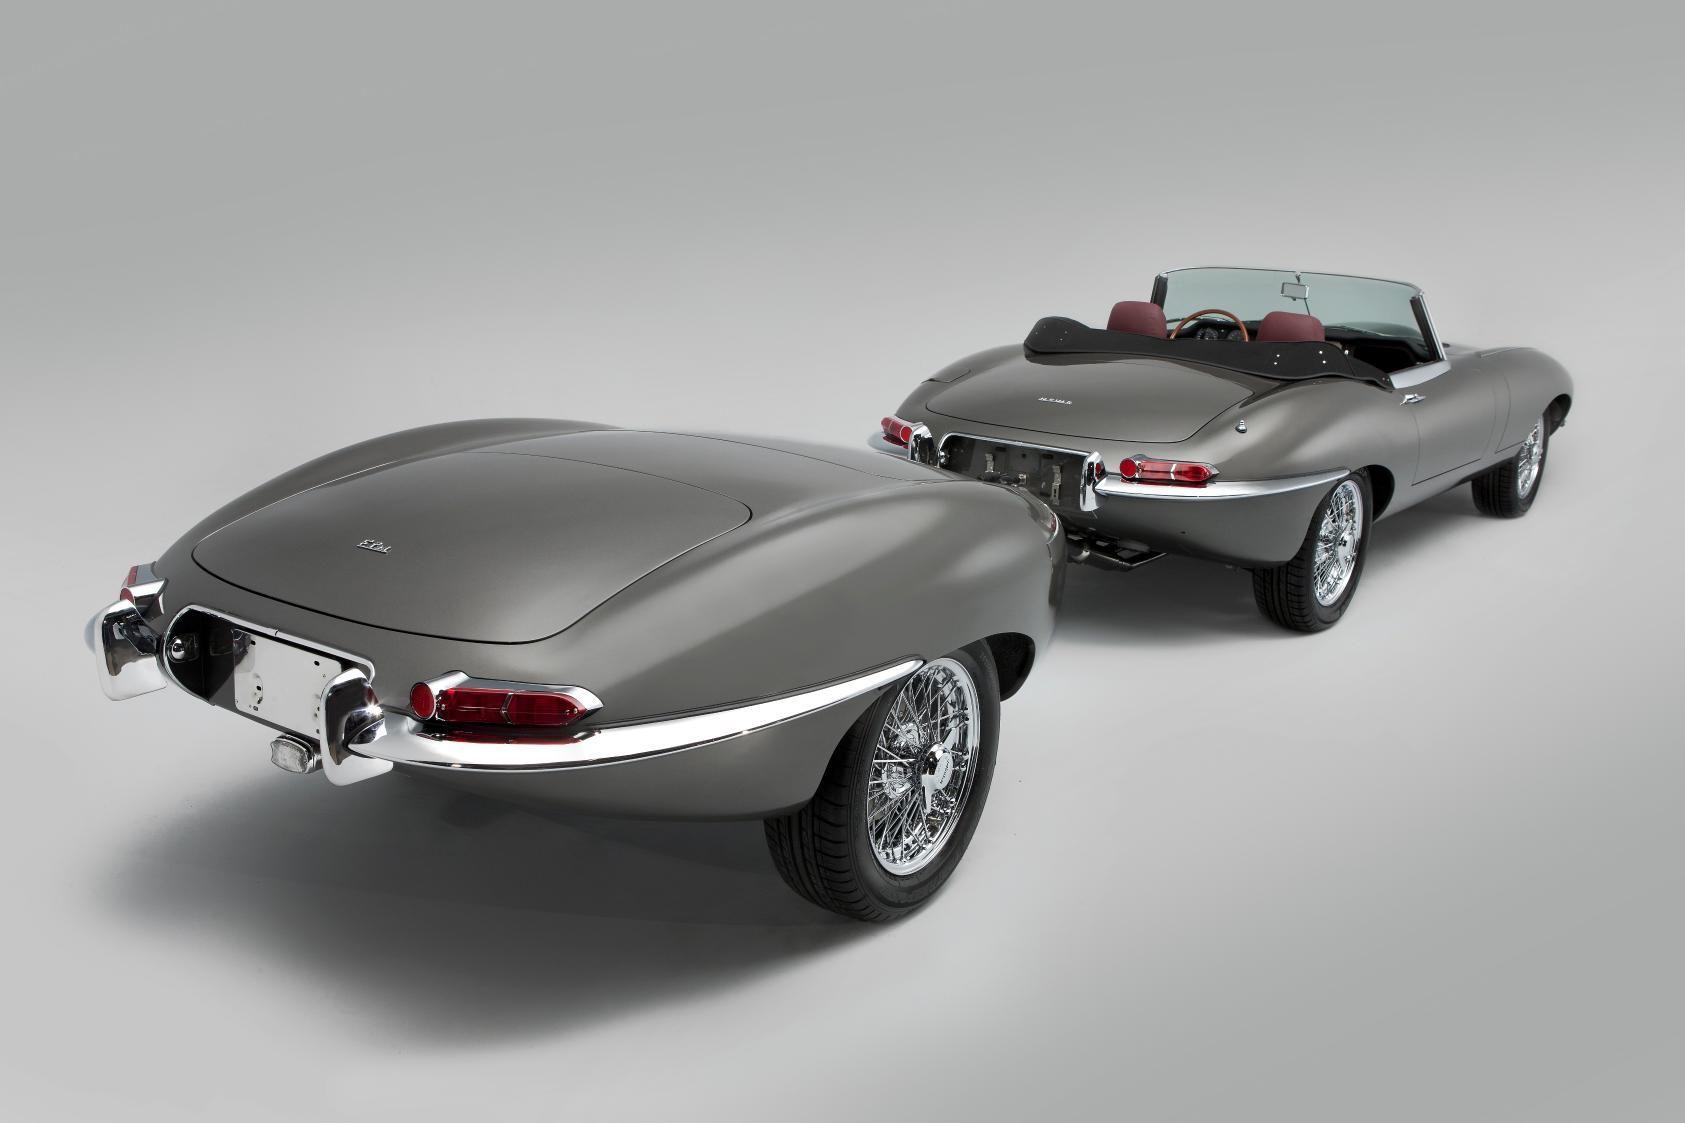 unusual vehicles | Classic Motor Cars Unveils Unique Jaguar E-Type ...